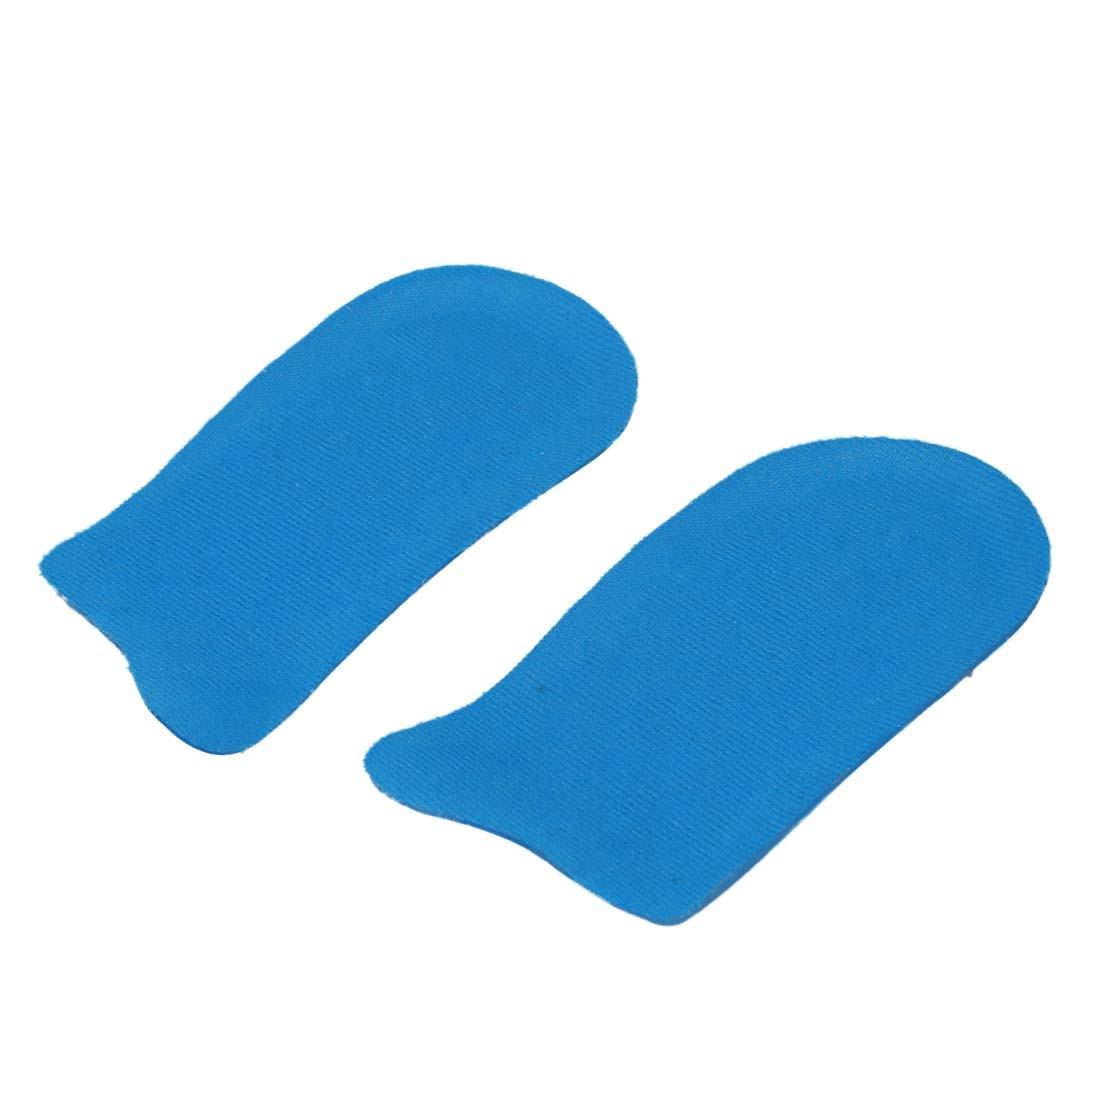 Fashion Boutique Pairlight Blue Silicone Gel Insole Best Heel Pad Insertion 4.3 cm Up вытяжка каминная gorenje ghv92x